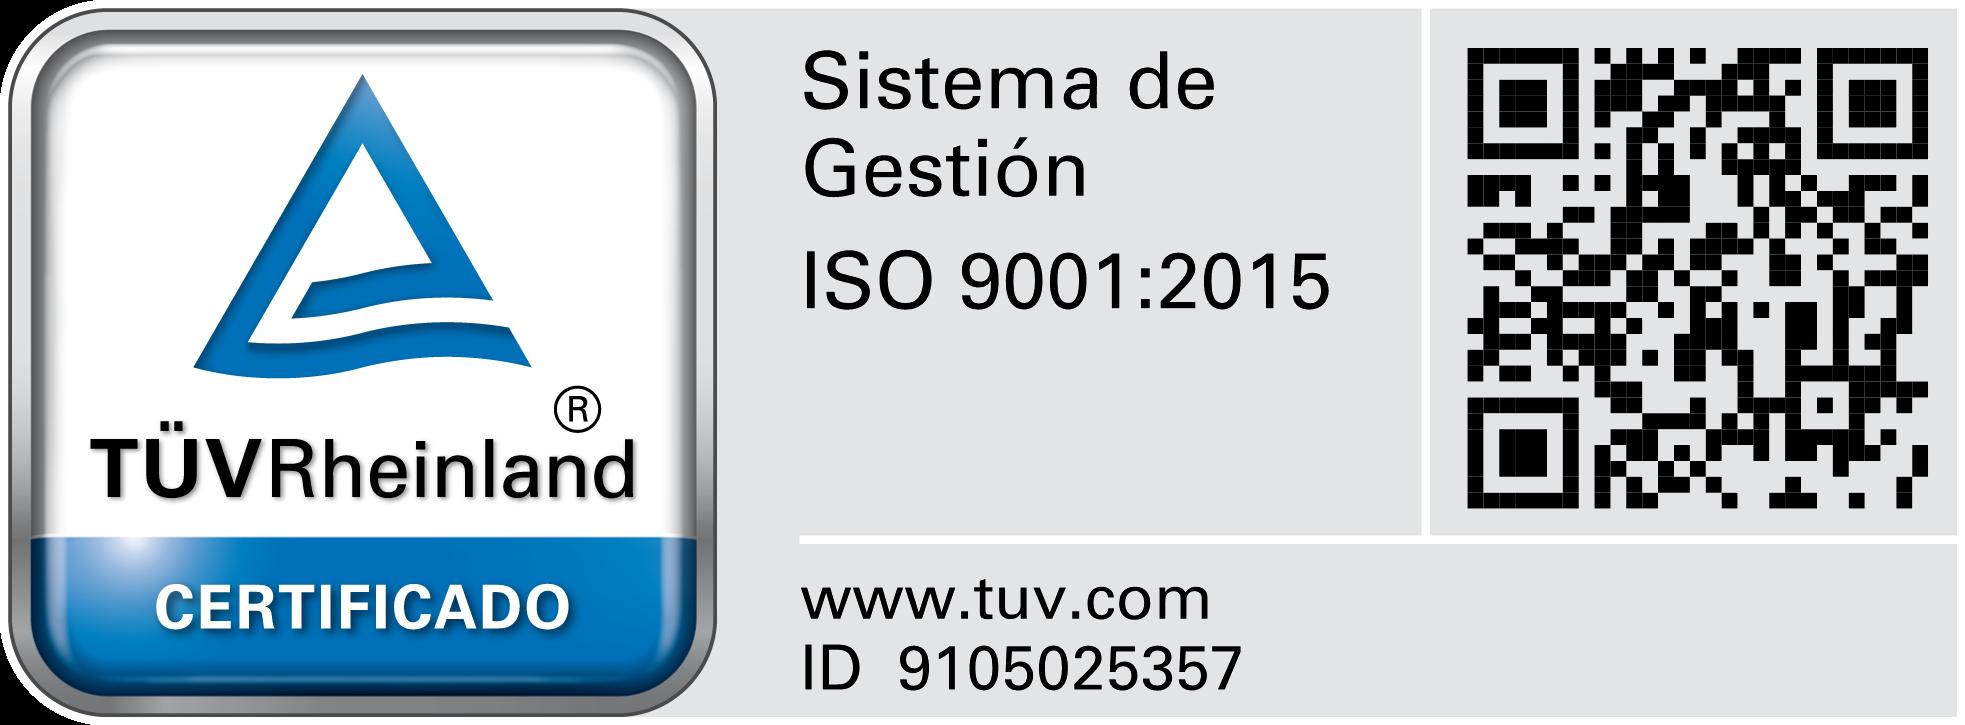 TR-Testmark_9105025357_ES_CMYK_with-QR-Code